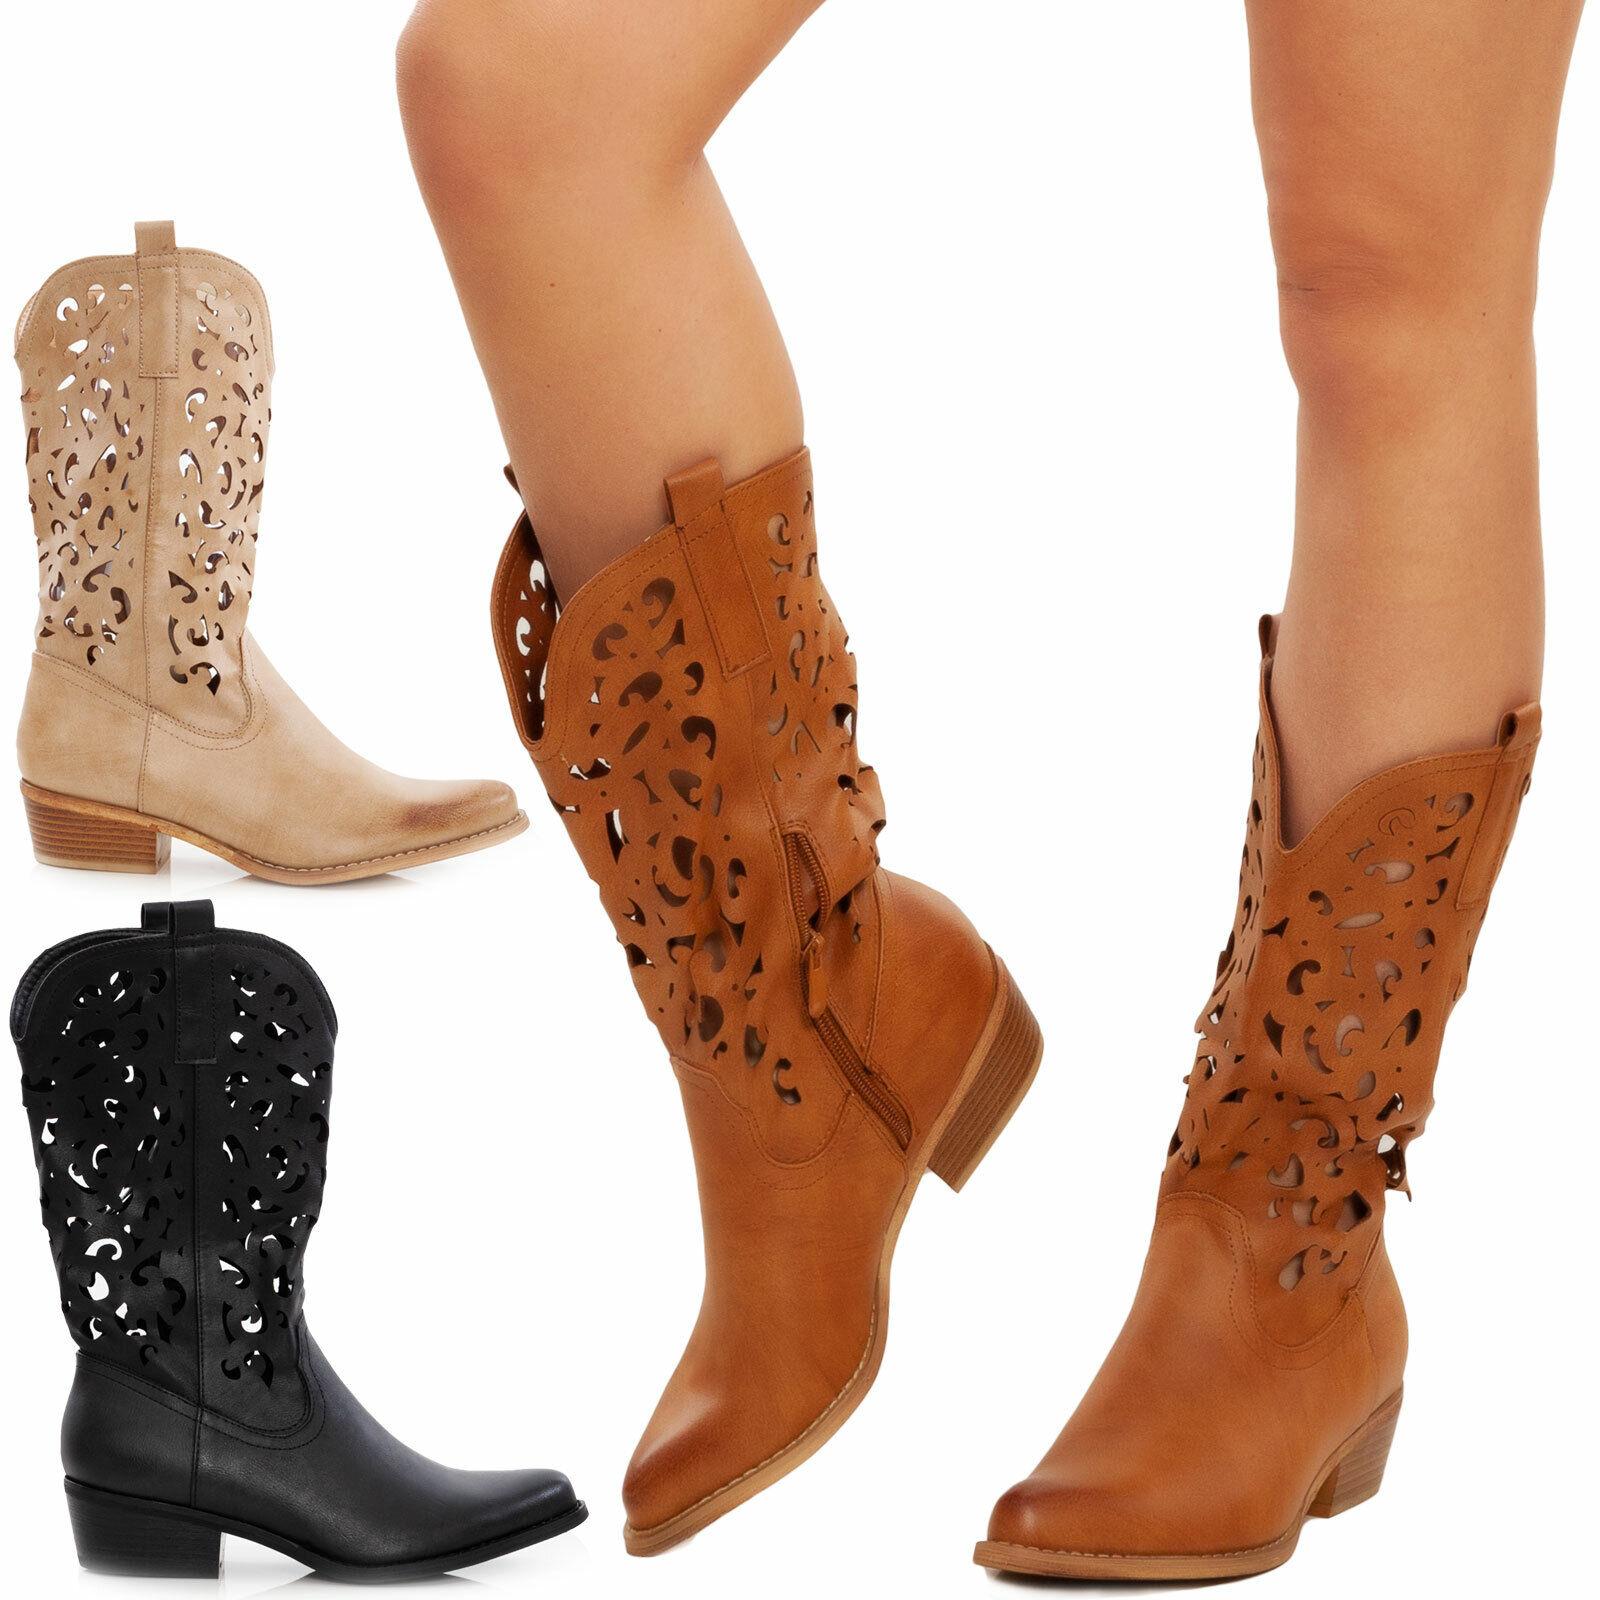 Scarpe donna stivali stivaletti texani camperos traforati